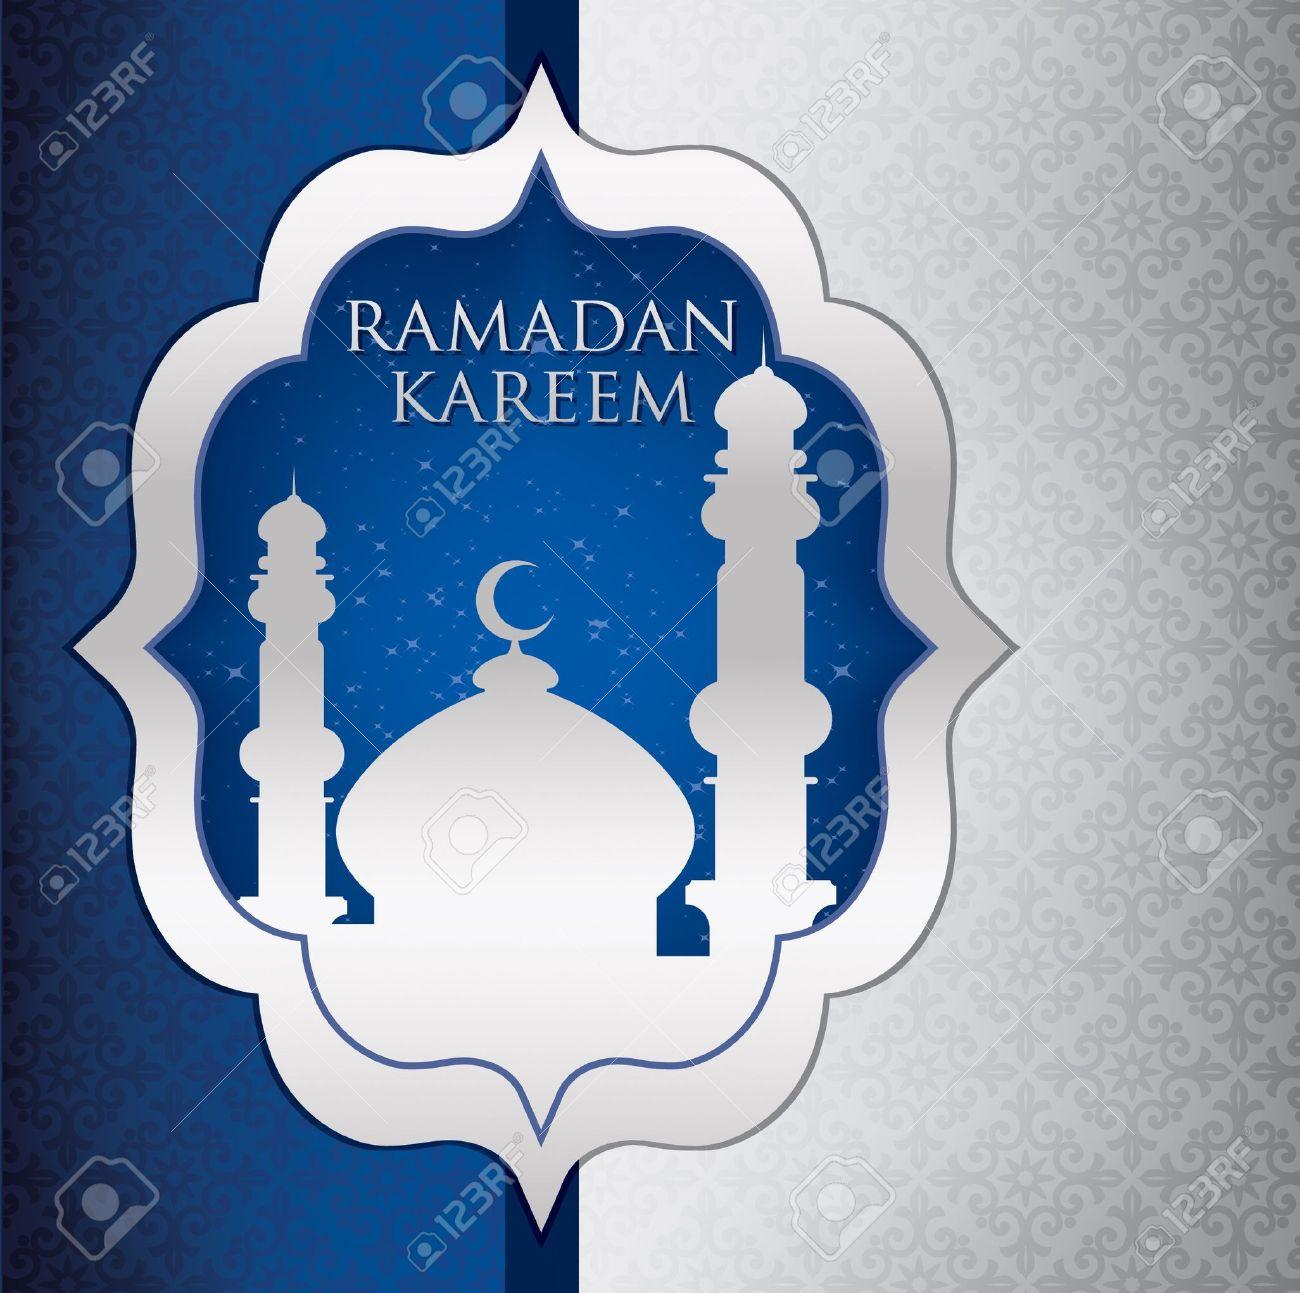 Mosque Ramadan Kareem Generous Ramadan Card In Format Royalty Free ...